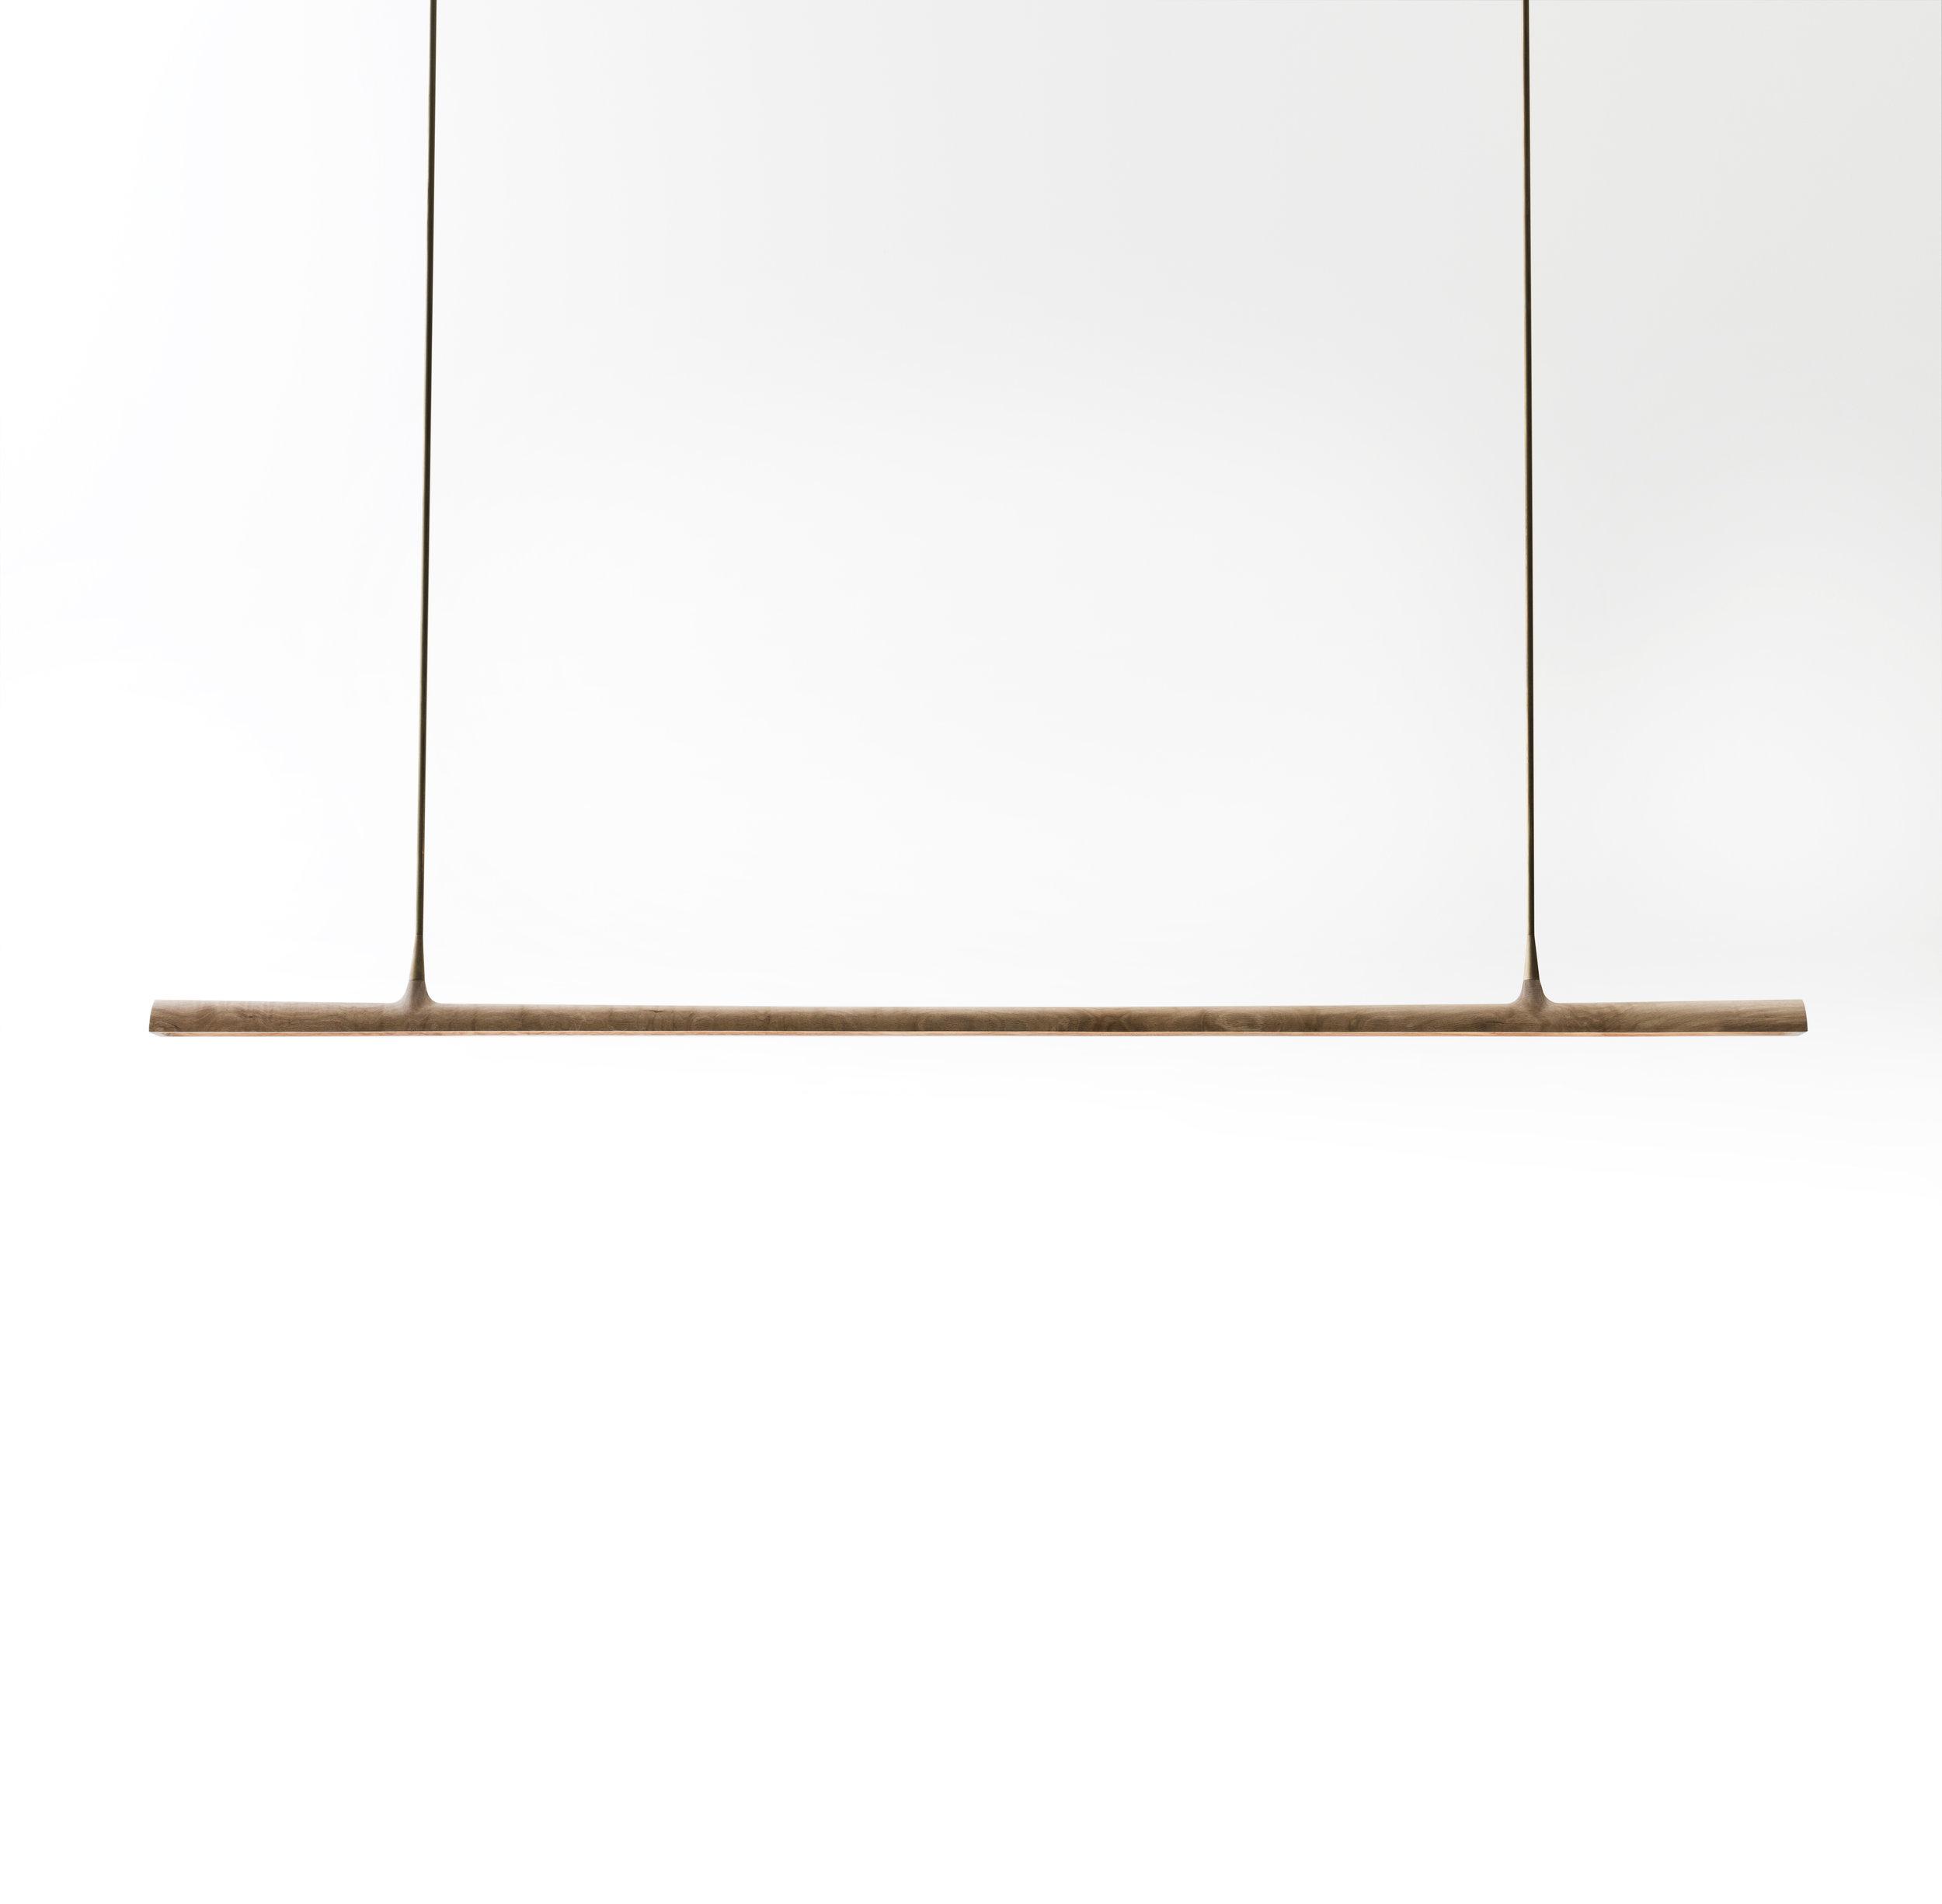 Alex-Earl-Olid-Linear timber LED light fitting.jpg